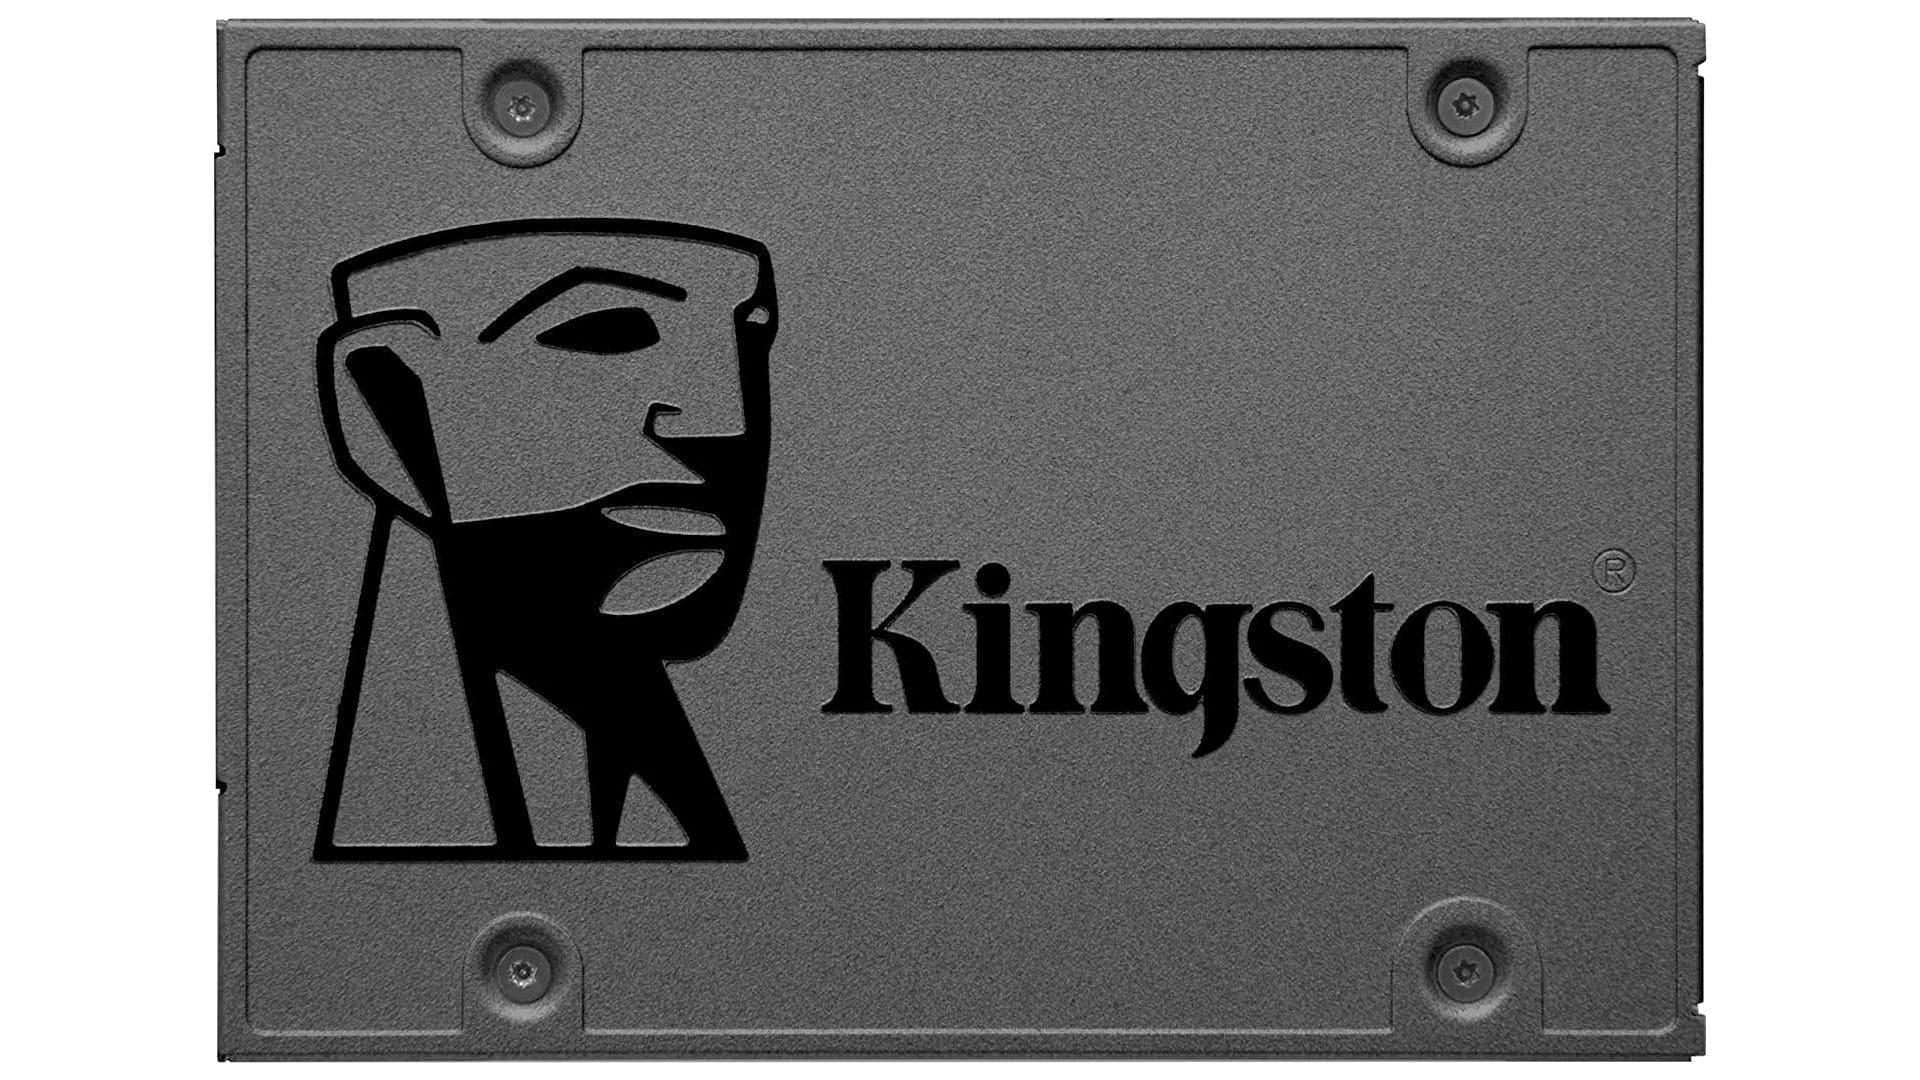 SSD 480GB Kingston SA400S37 preto em fundo branco